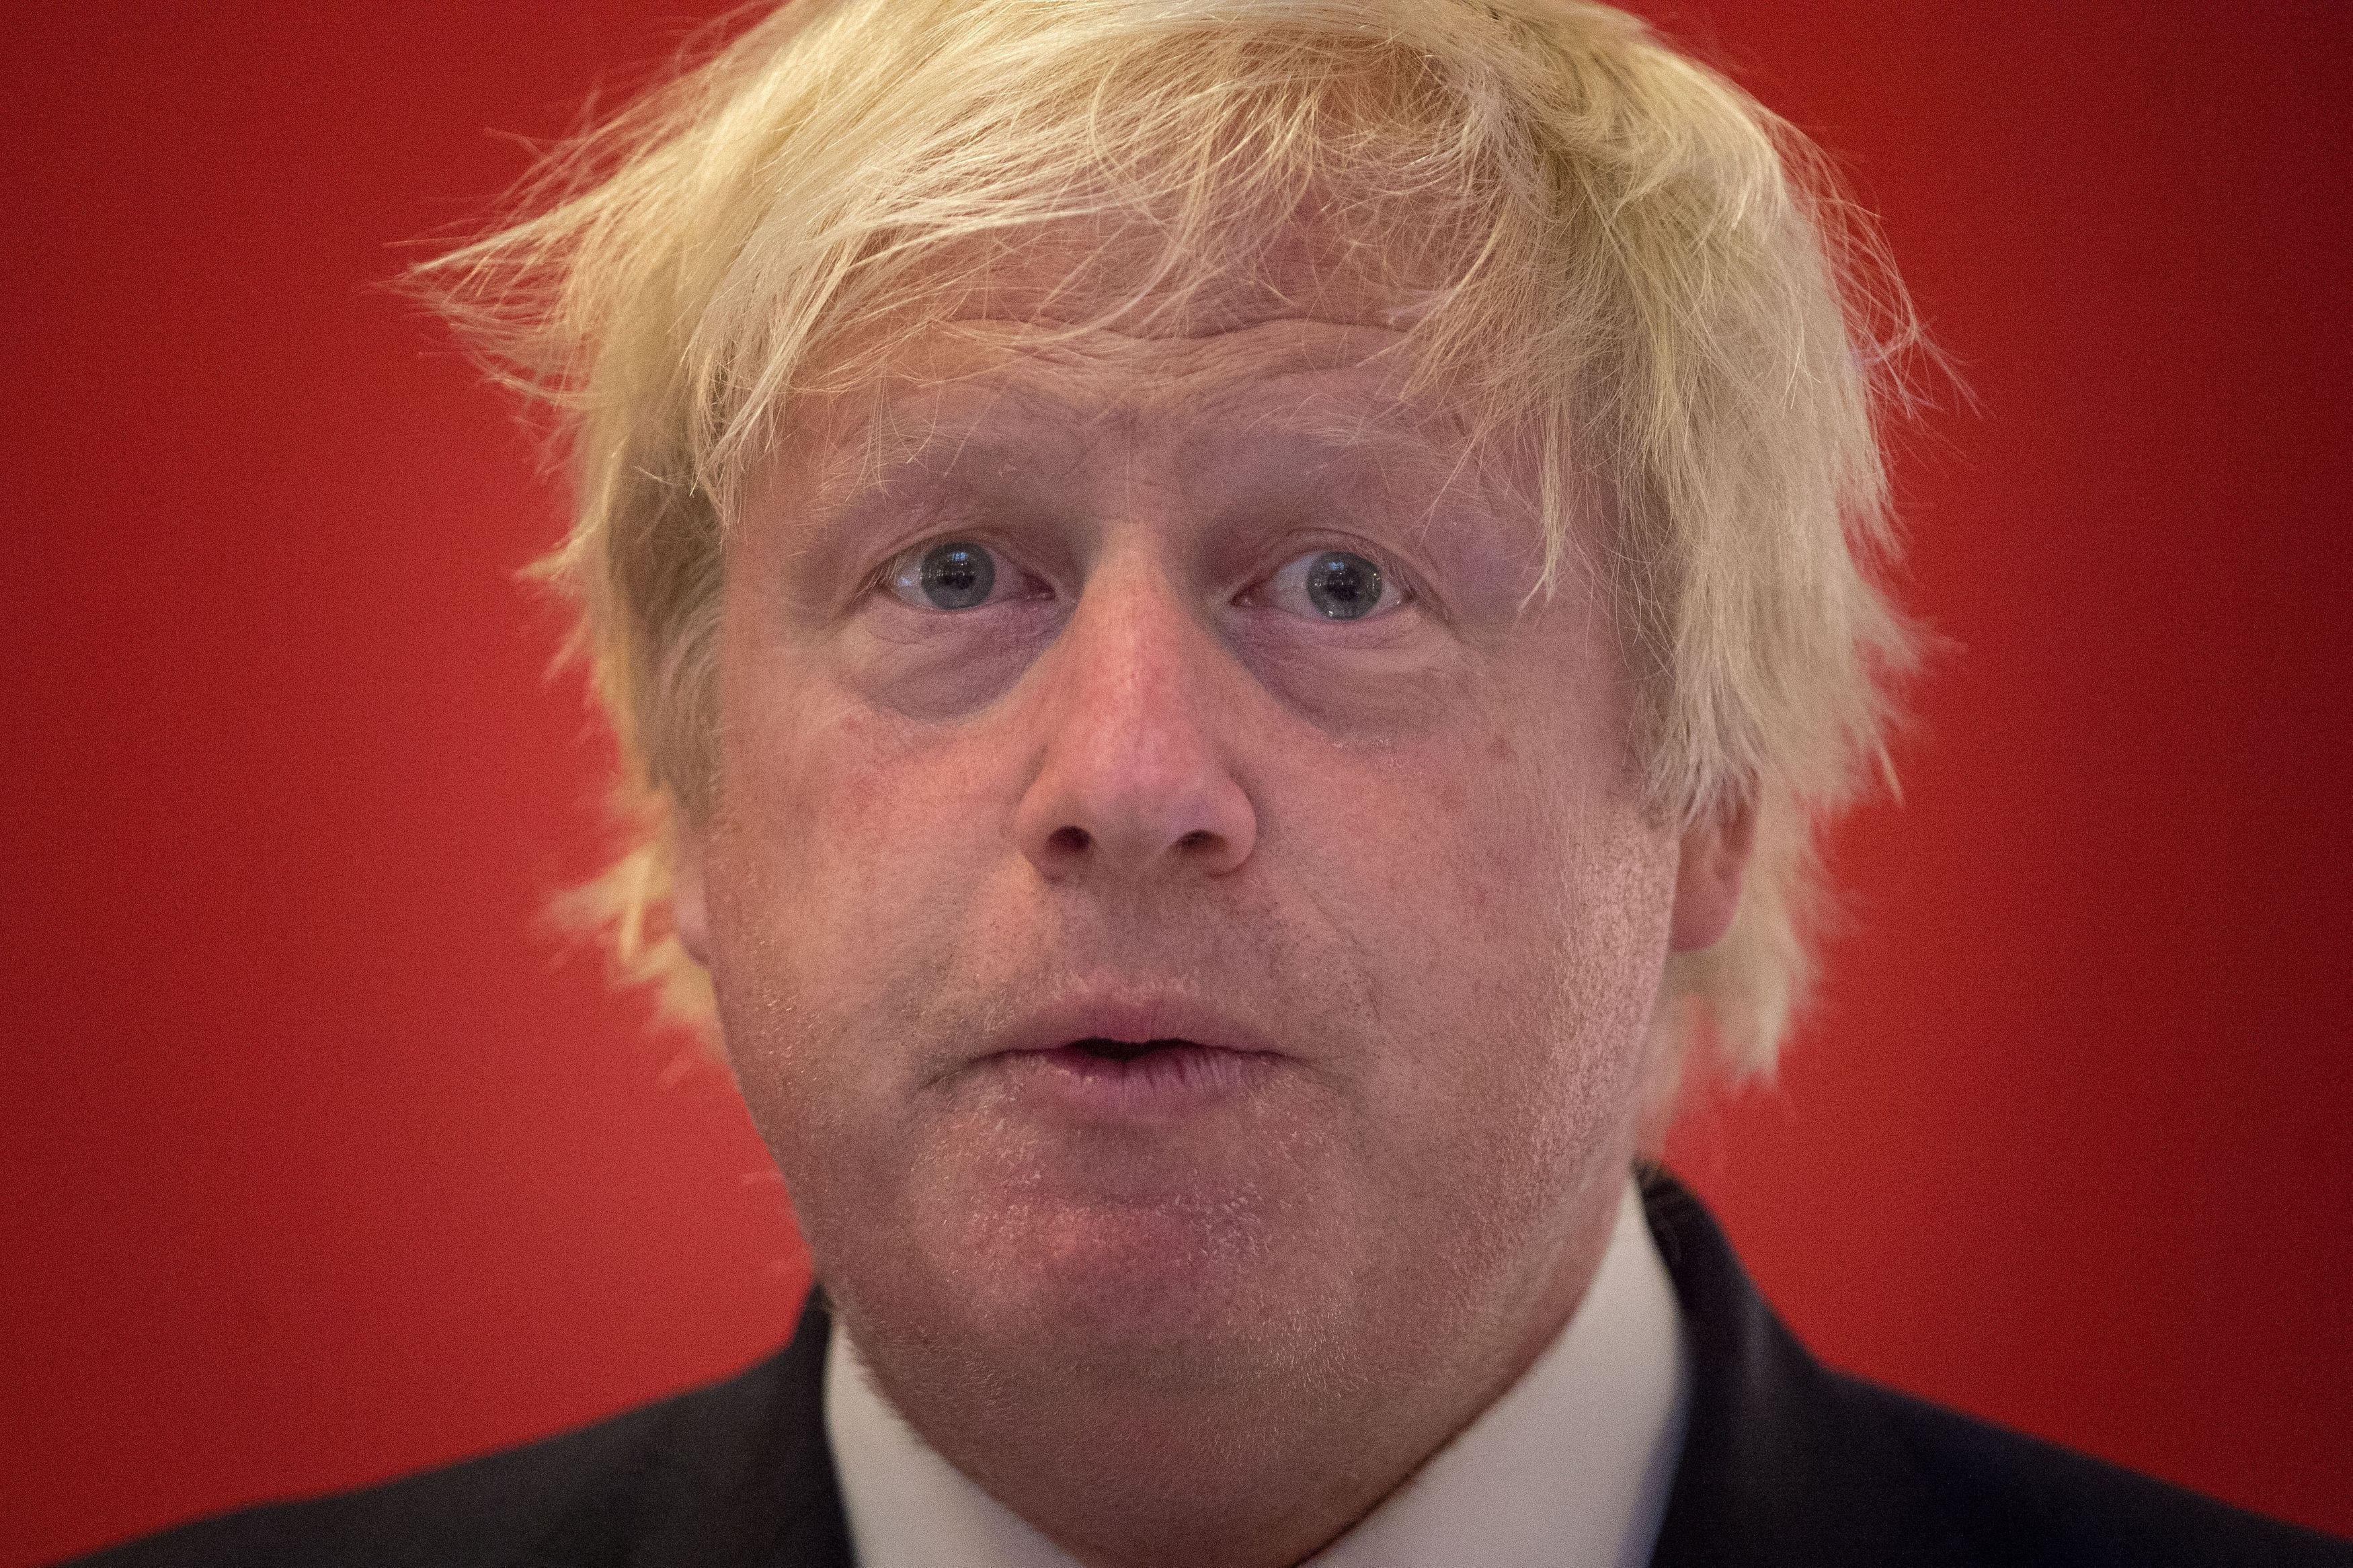 Boris Johnson in colonial poem gaffe at Burmese temple